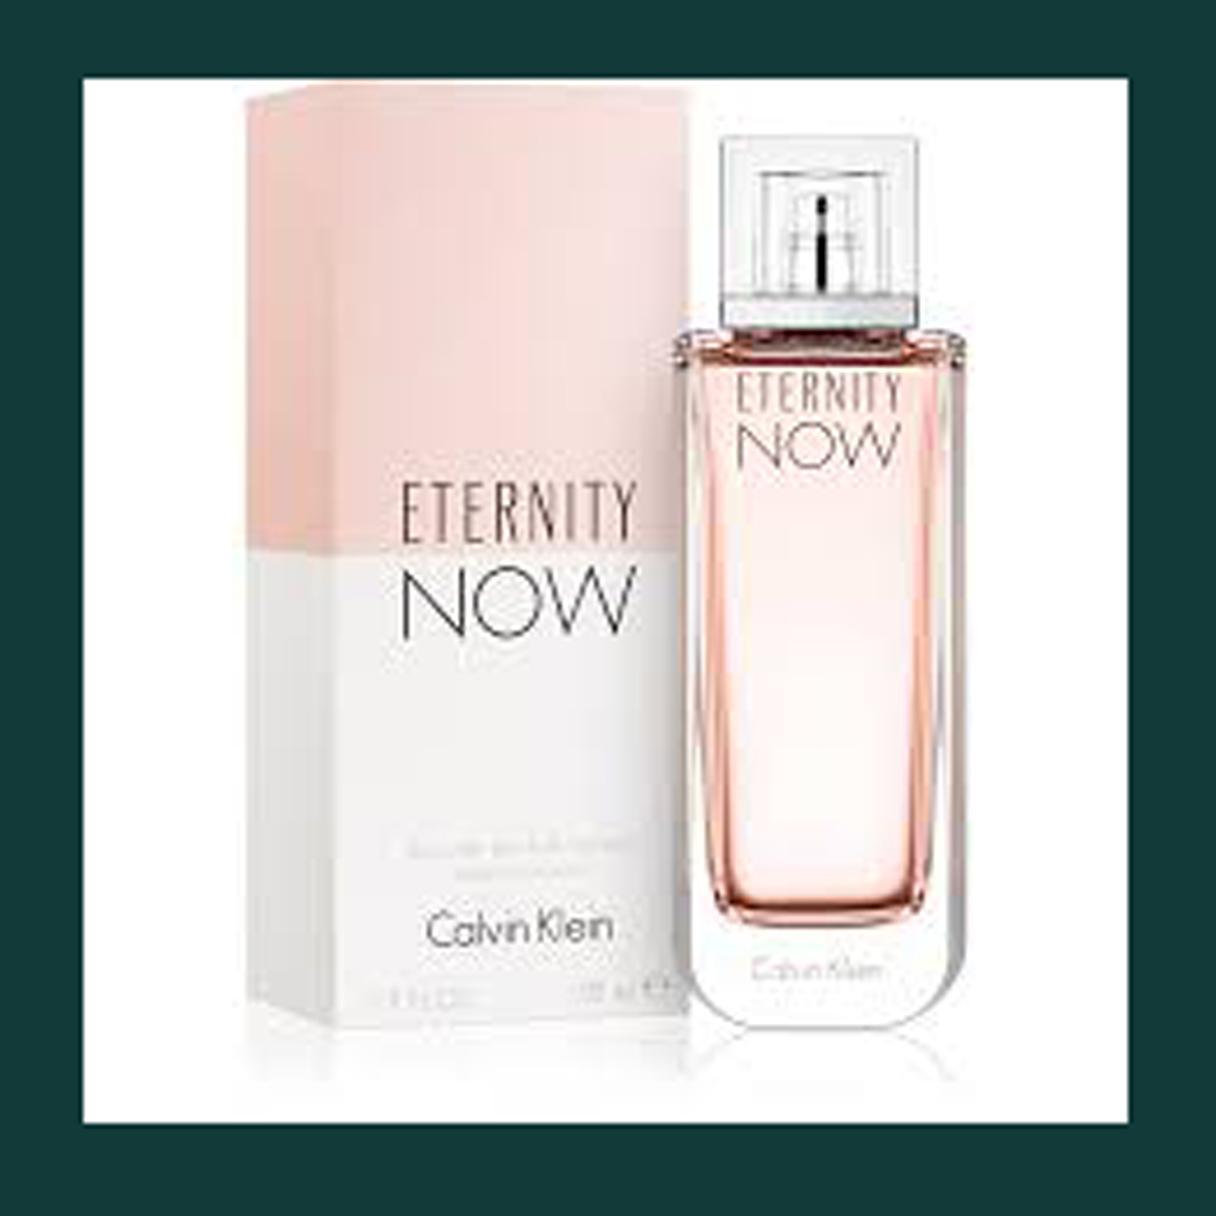 Parfum Wanita import murah terlaris Eternity Now Edp 100ml